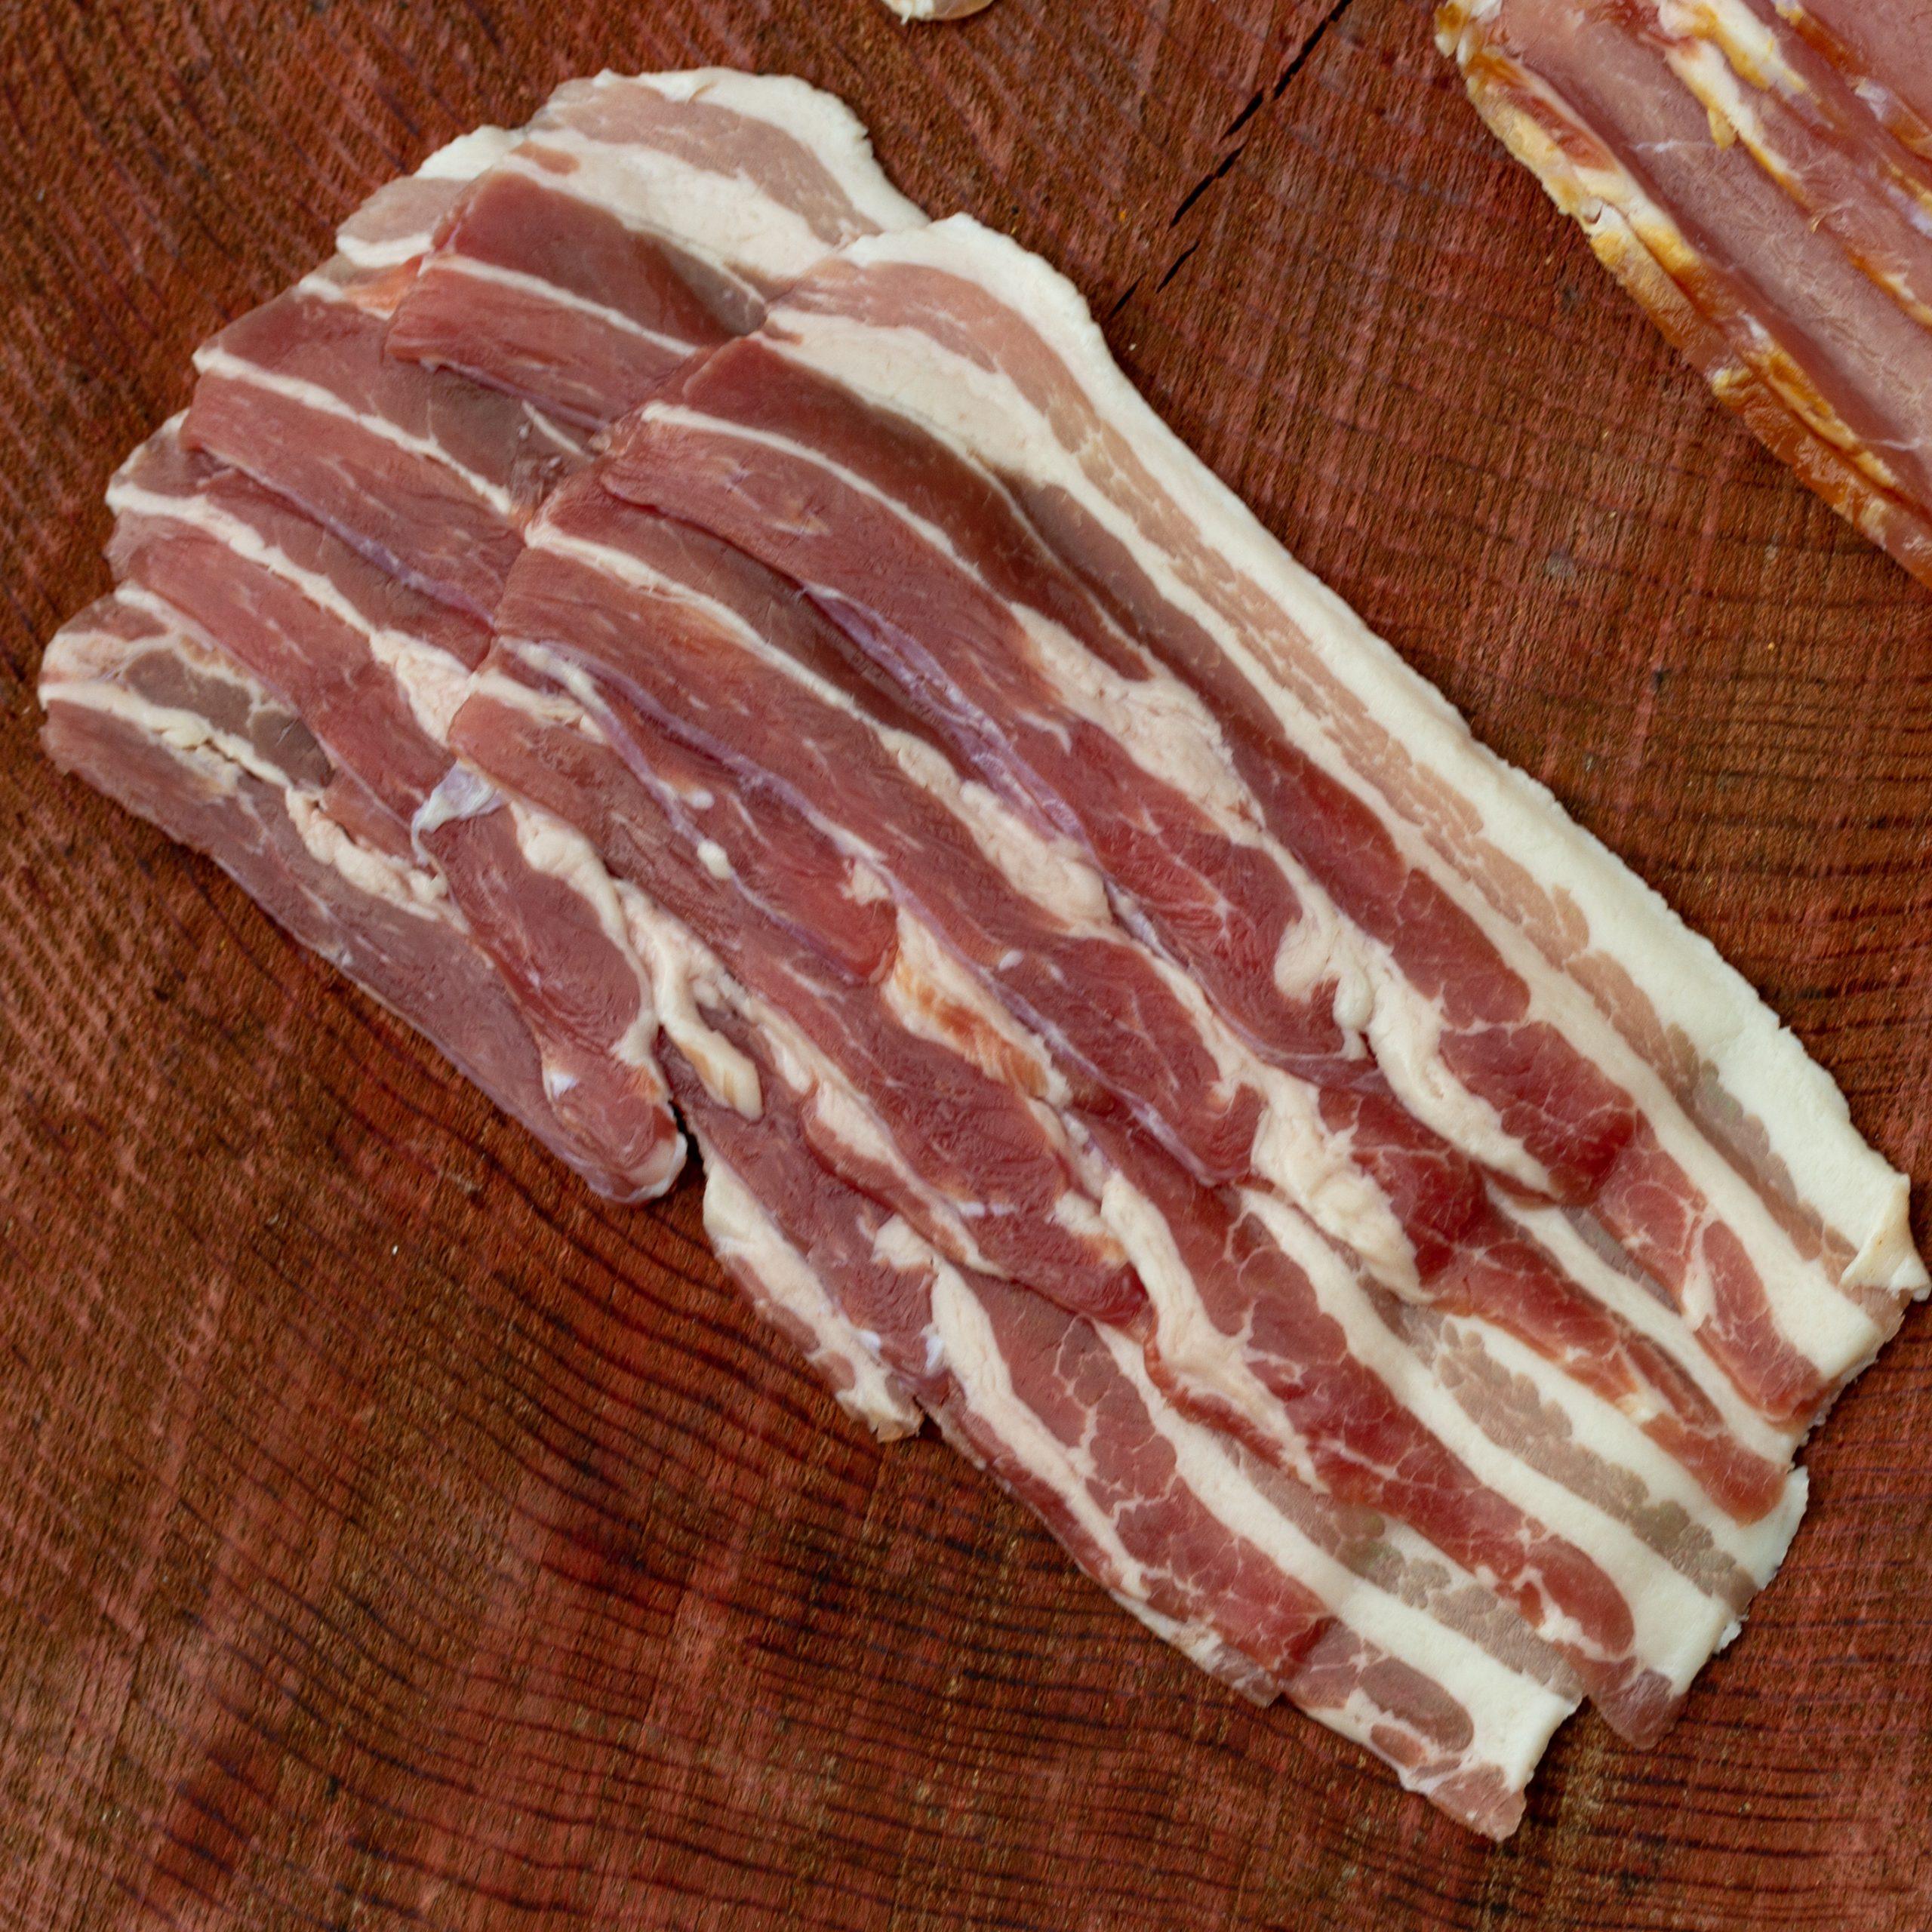 Cumbrian Traditionally dry-cured streaky bacon